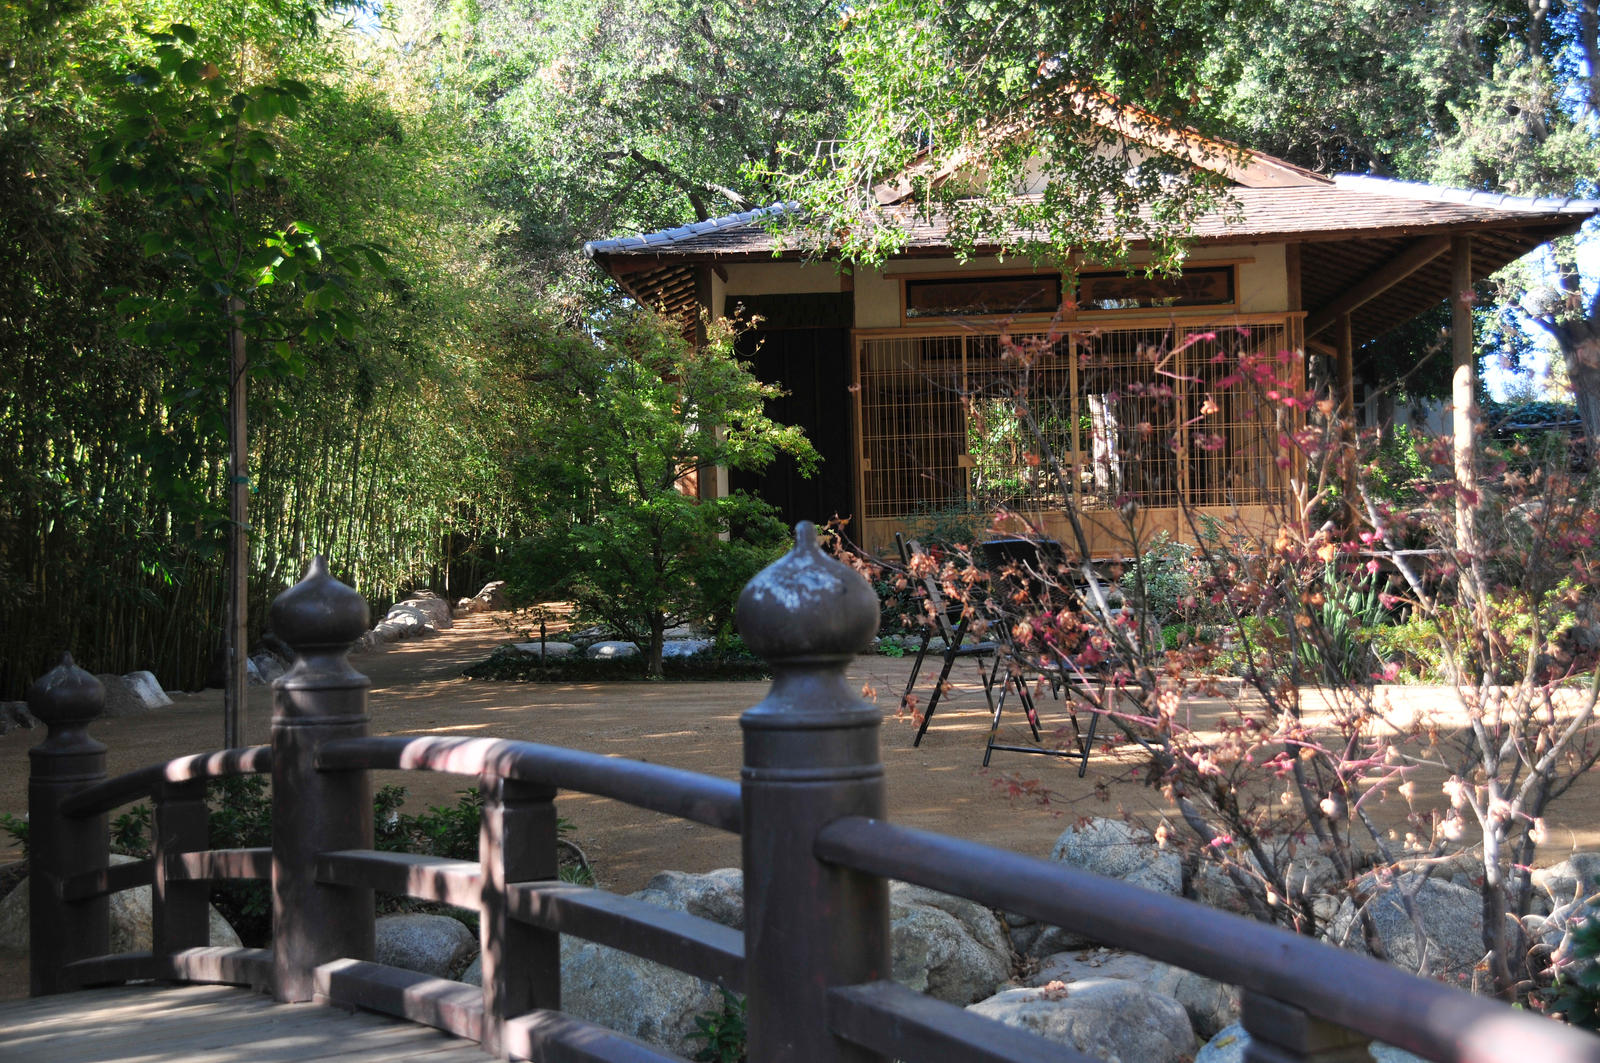 Teahouse Chairs and Soribashi